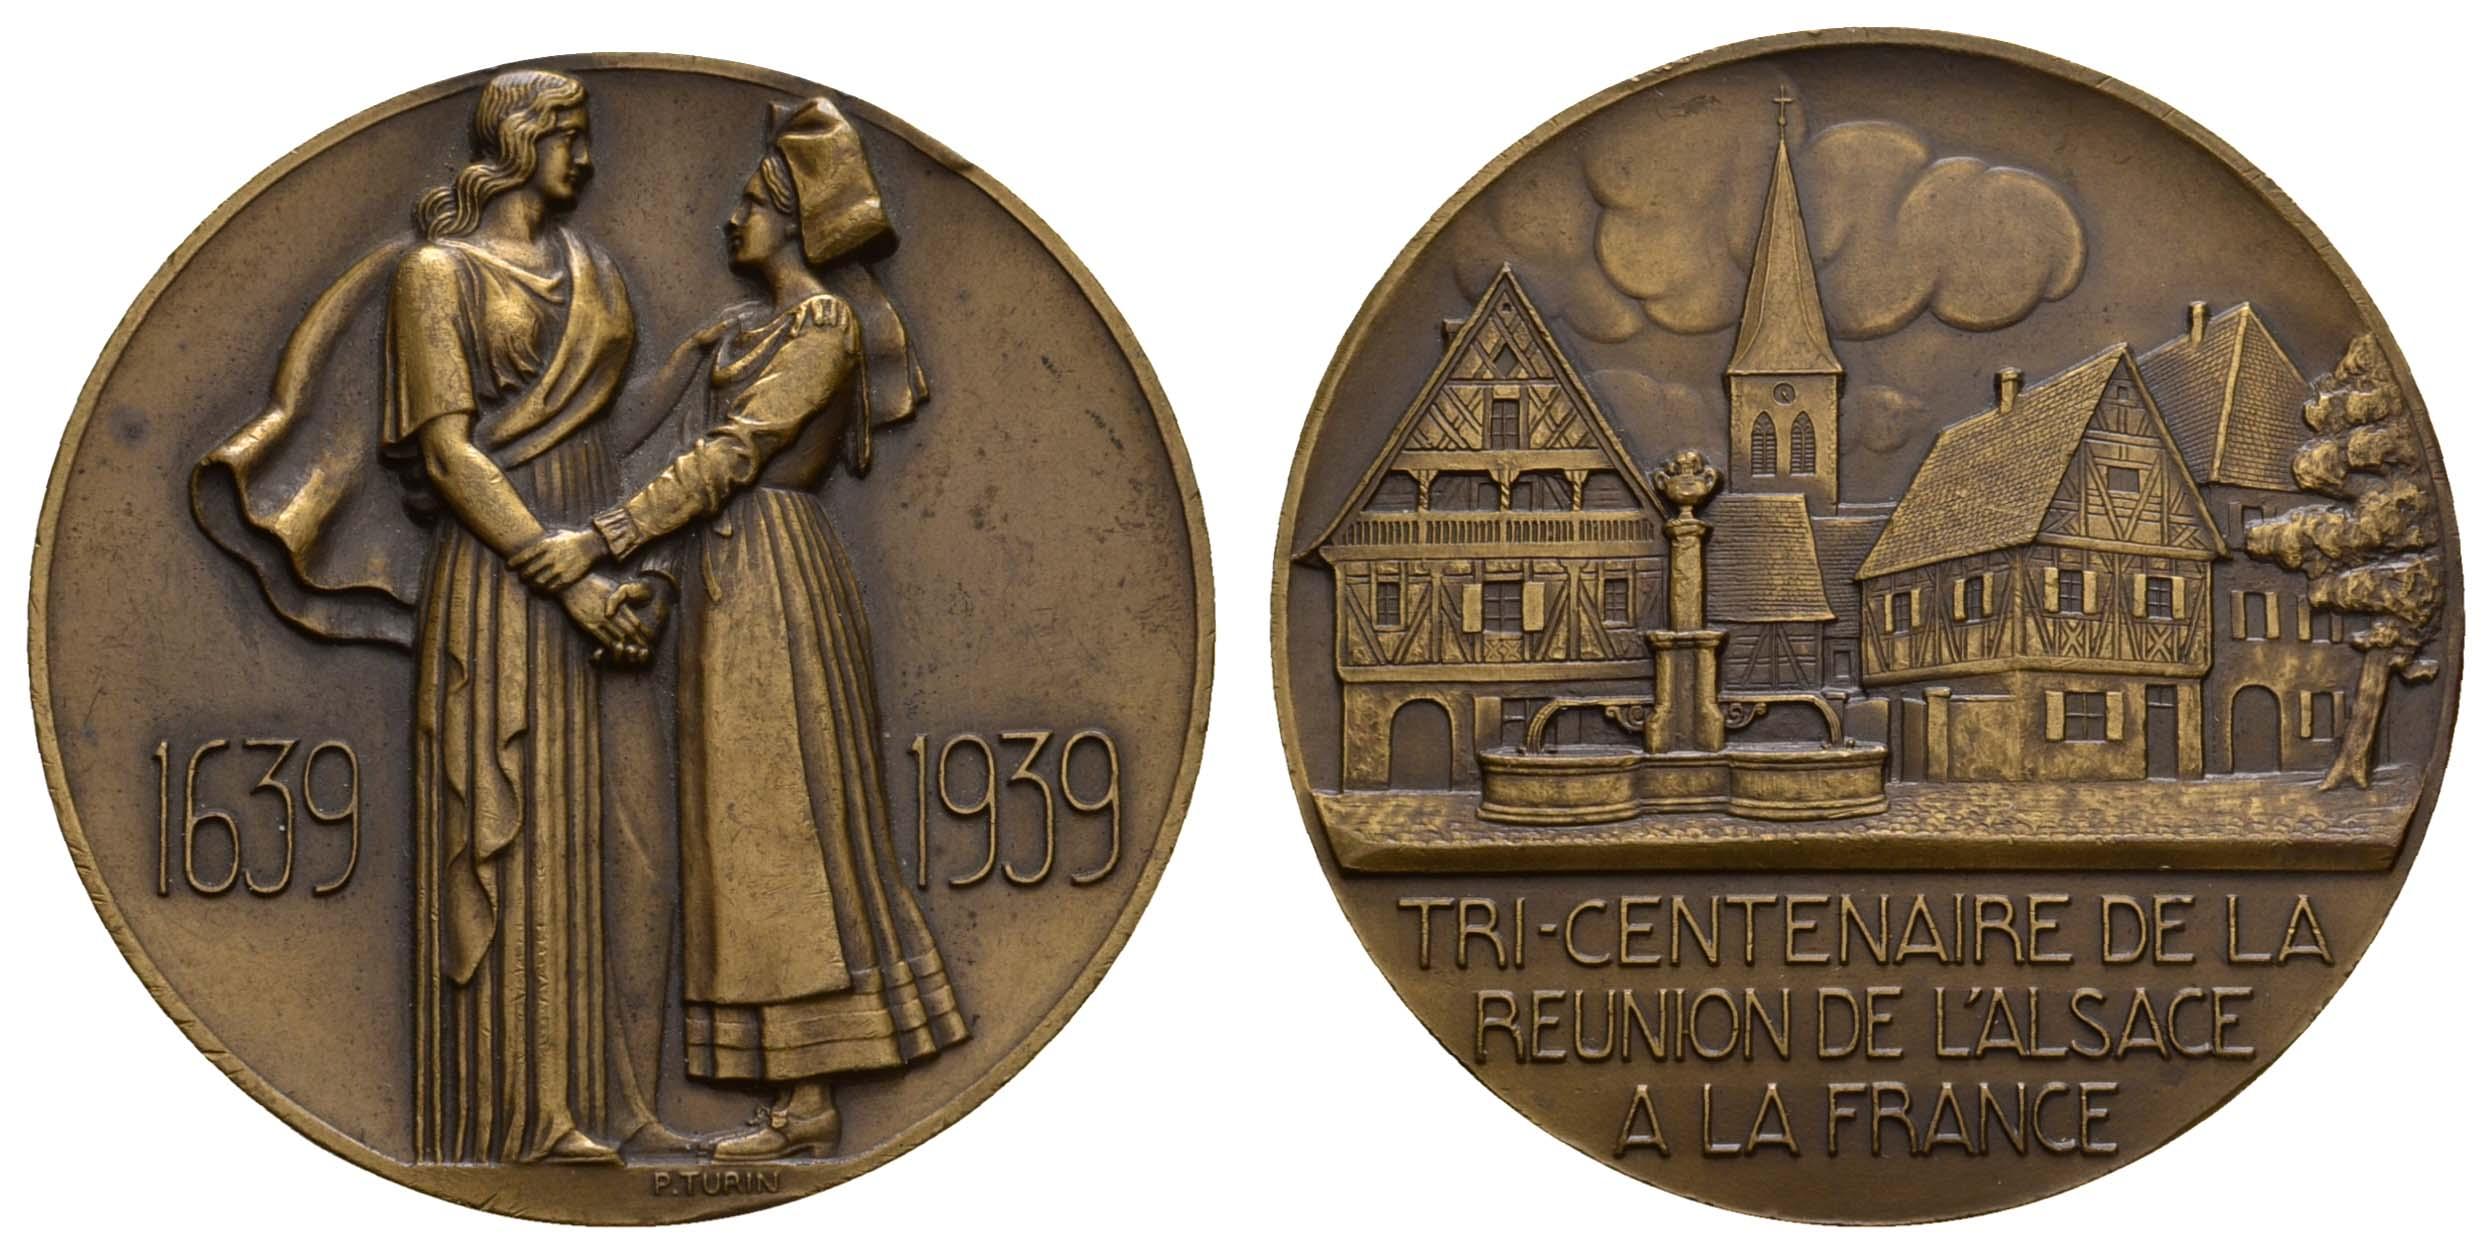 Lot 2270 - medaillen Sonstige Medaillen - Europa -  Auktionshaus Ulrich Felzmann GmbH & Co. KG Coins single lots